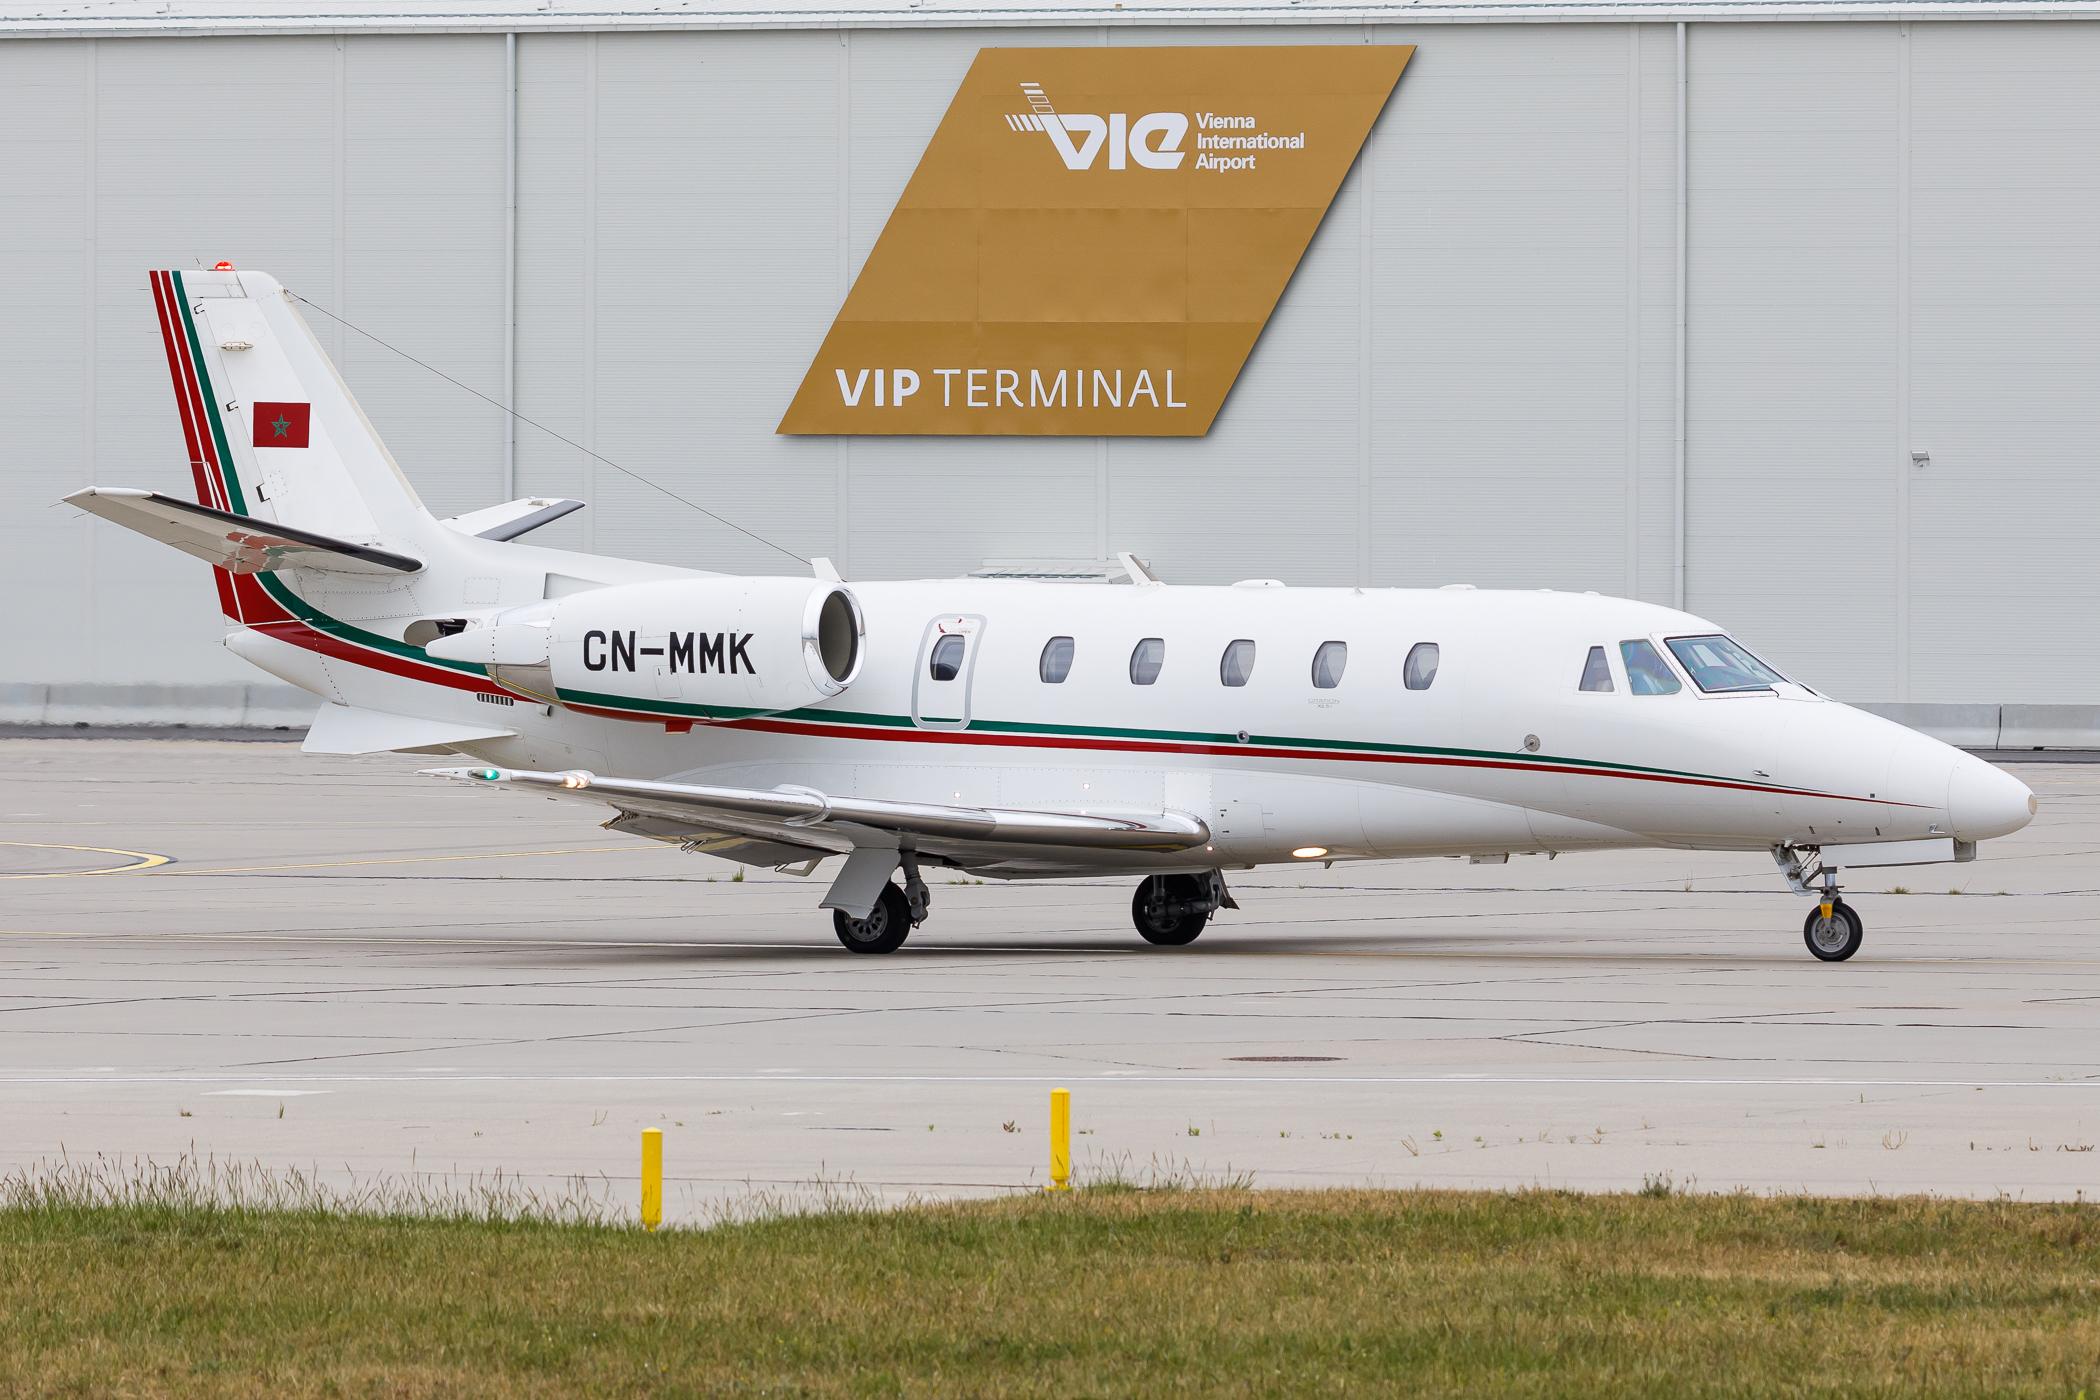 FRA: Avions VIP, Liaison & ECM - Page 24 49894756211_e299a9bffb_o_d